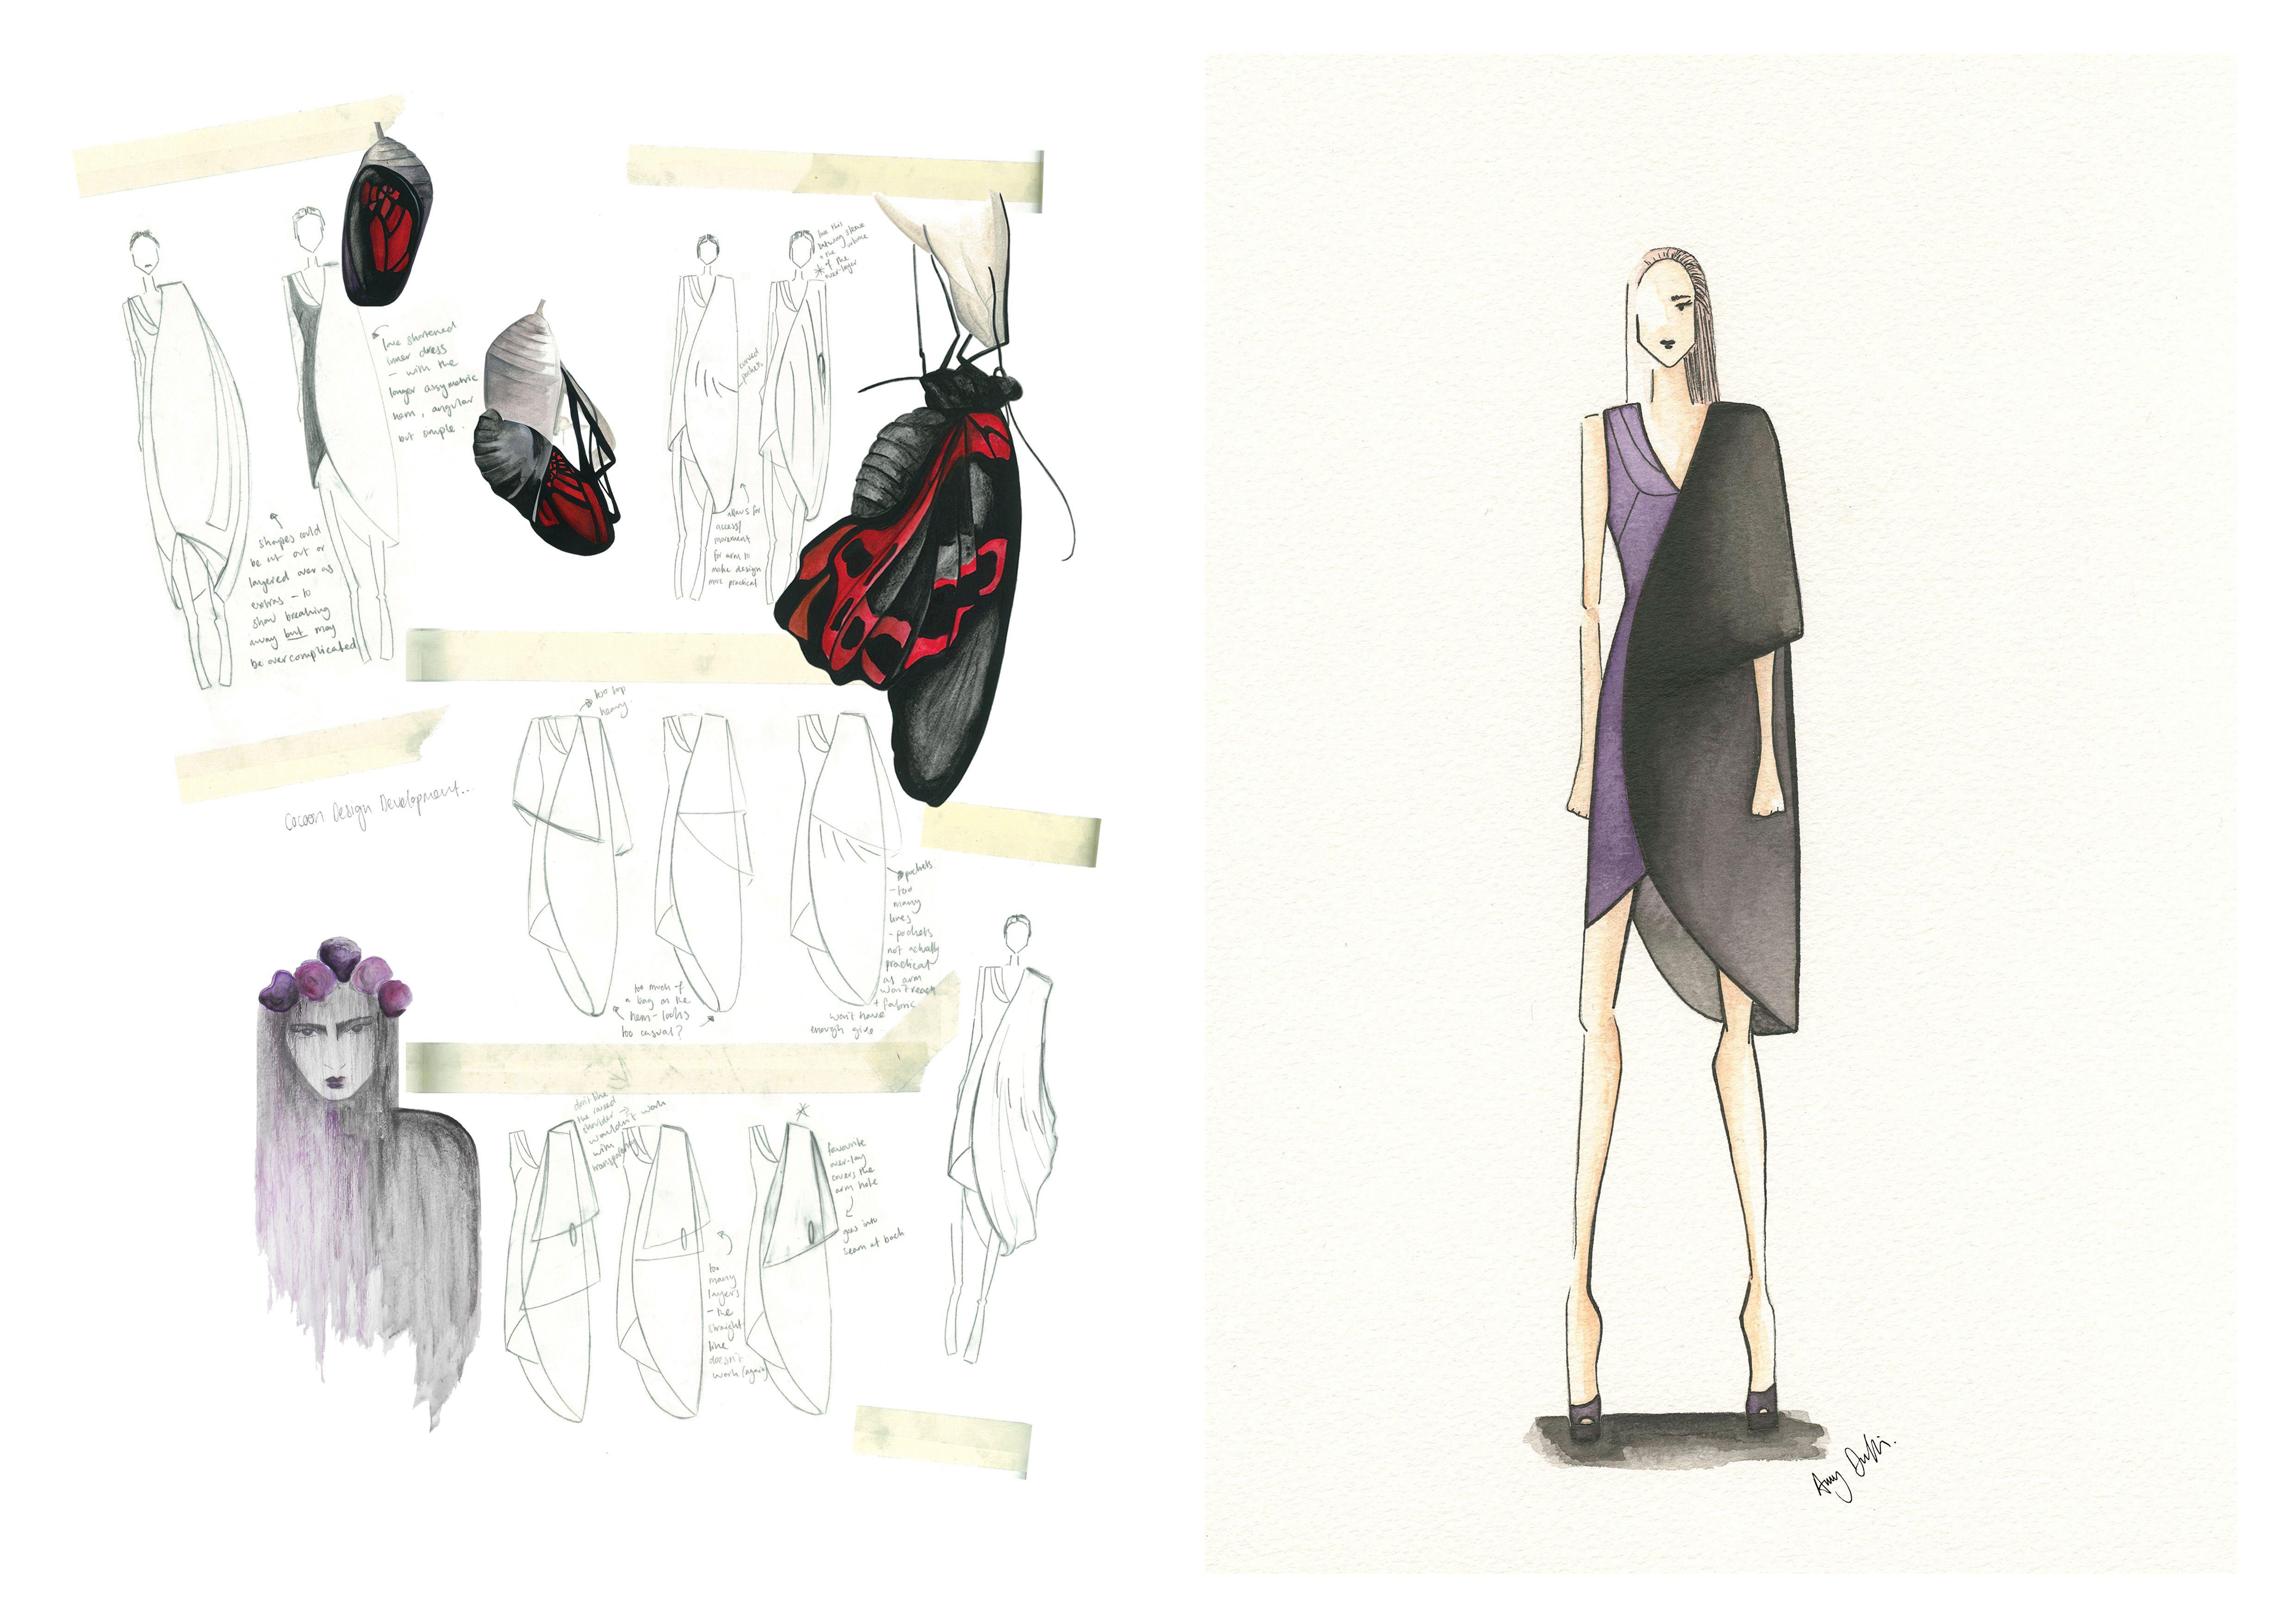 Translucent B Design Development 2 #alotlikeamy #designportfolio #fashiondesign #cad #illustration